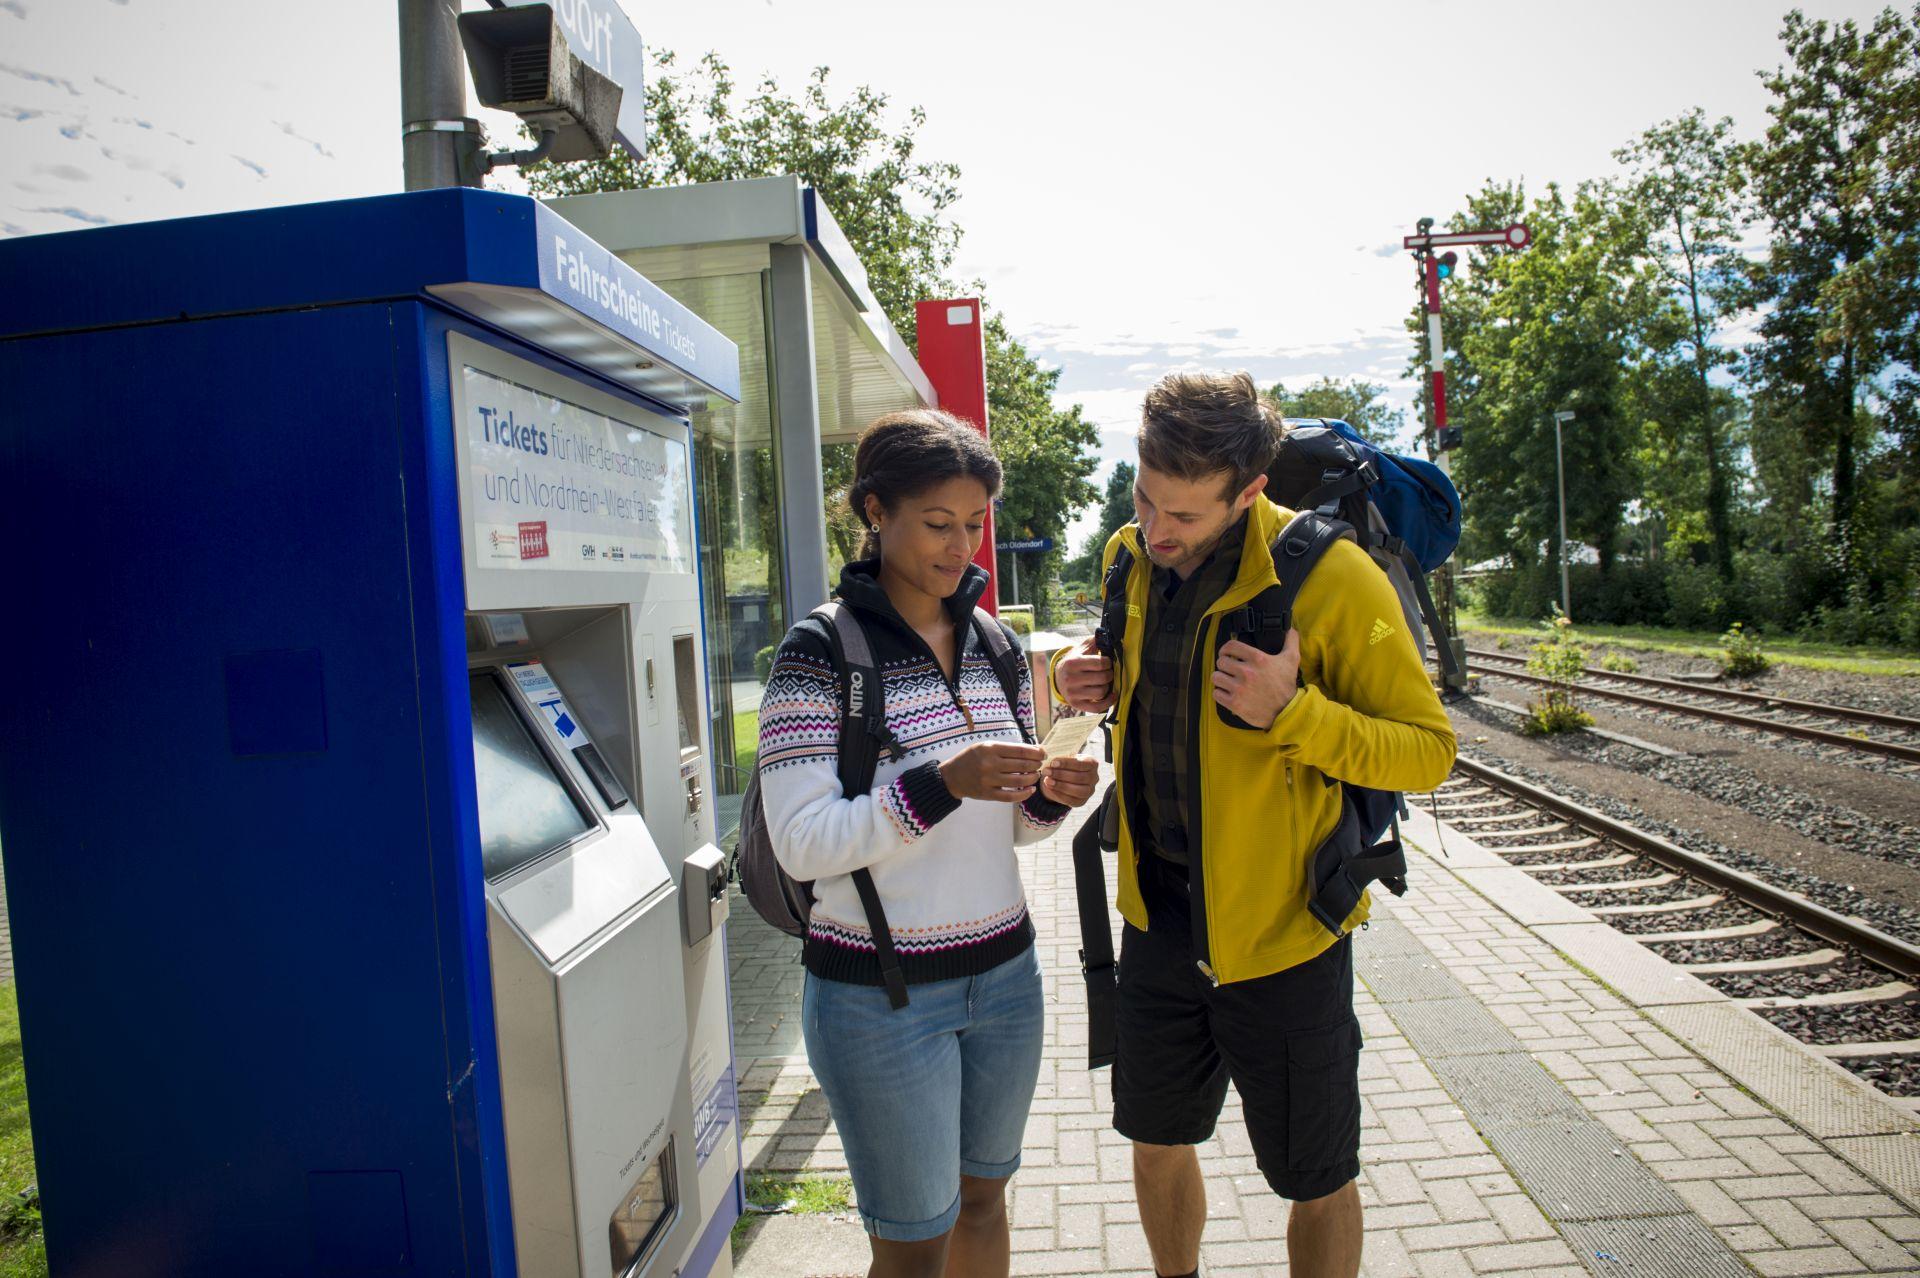 Fahrkartenautomat Hessisch Oldendorf